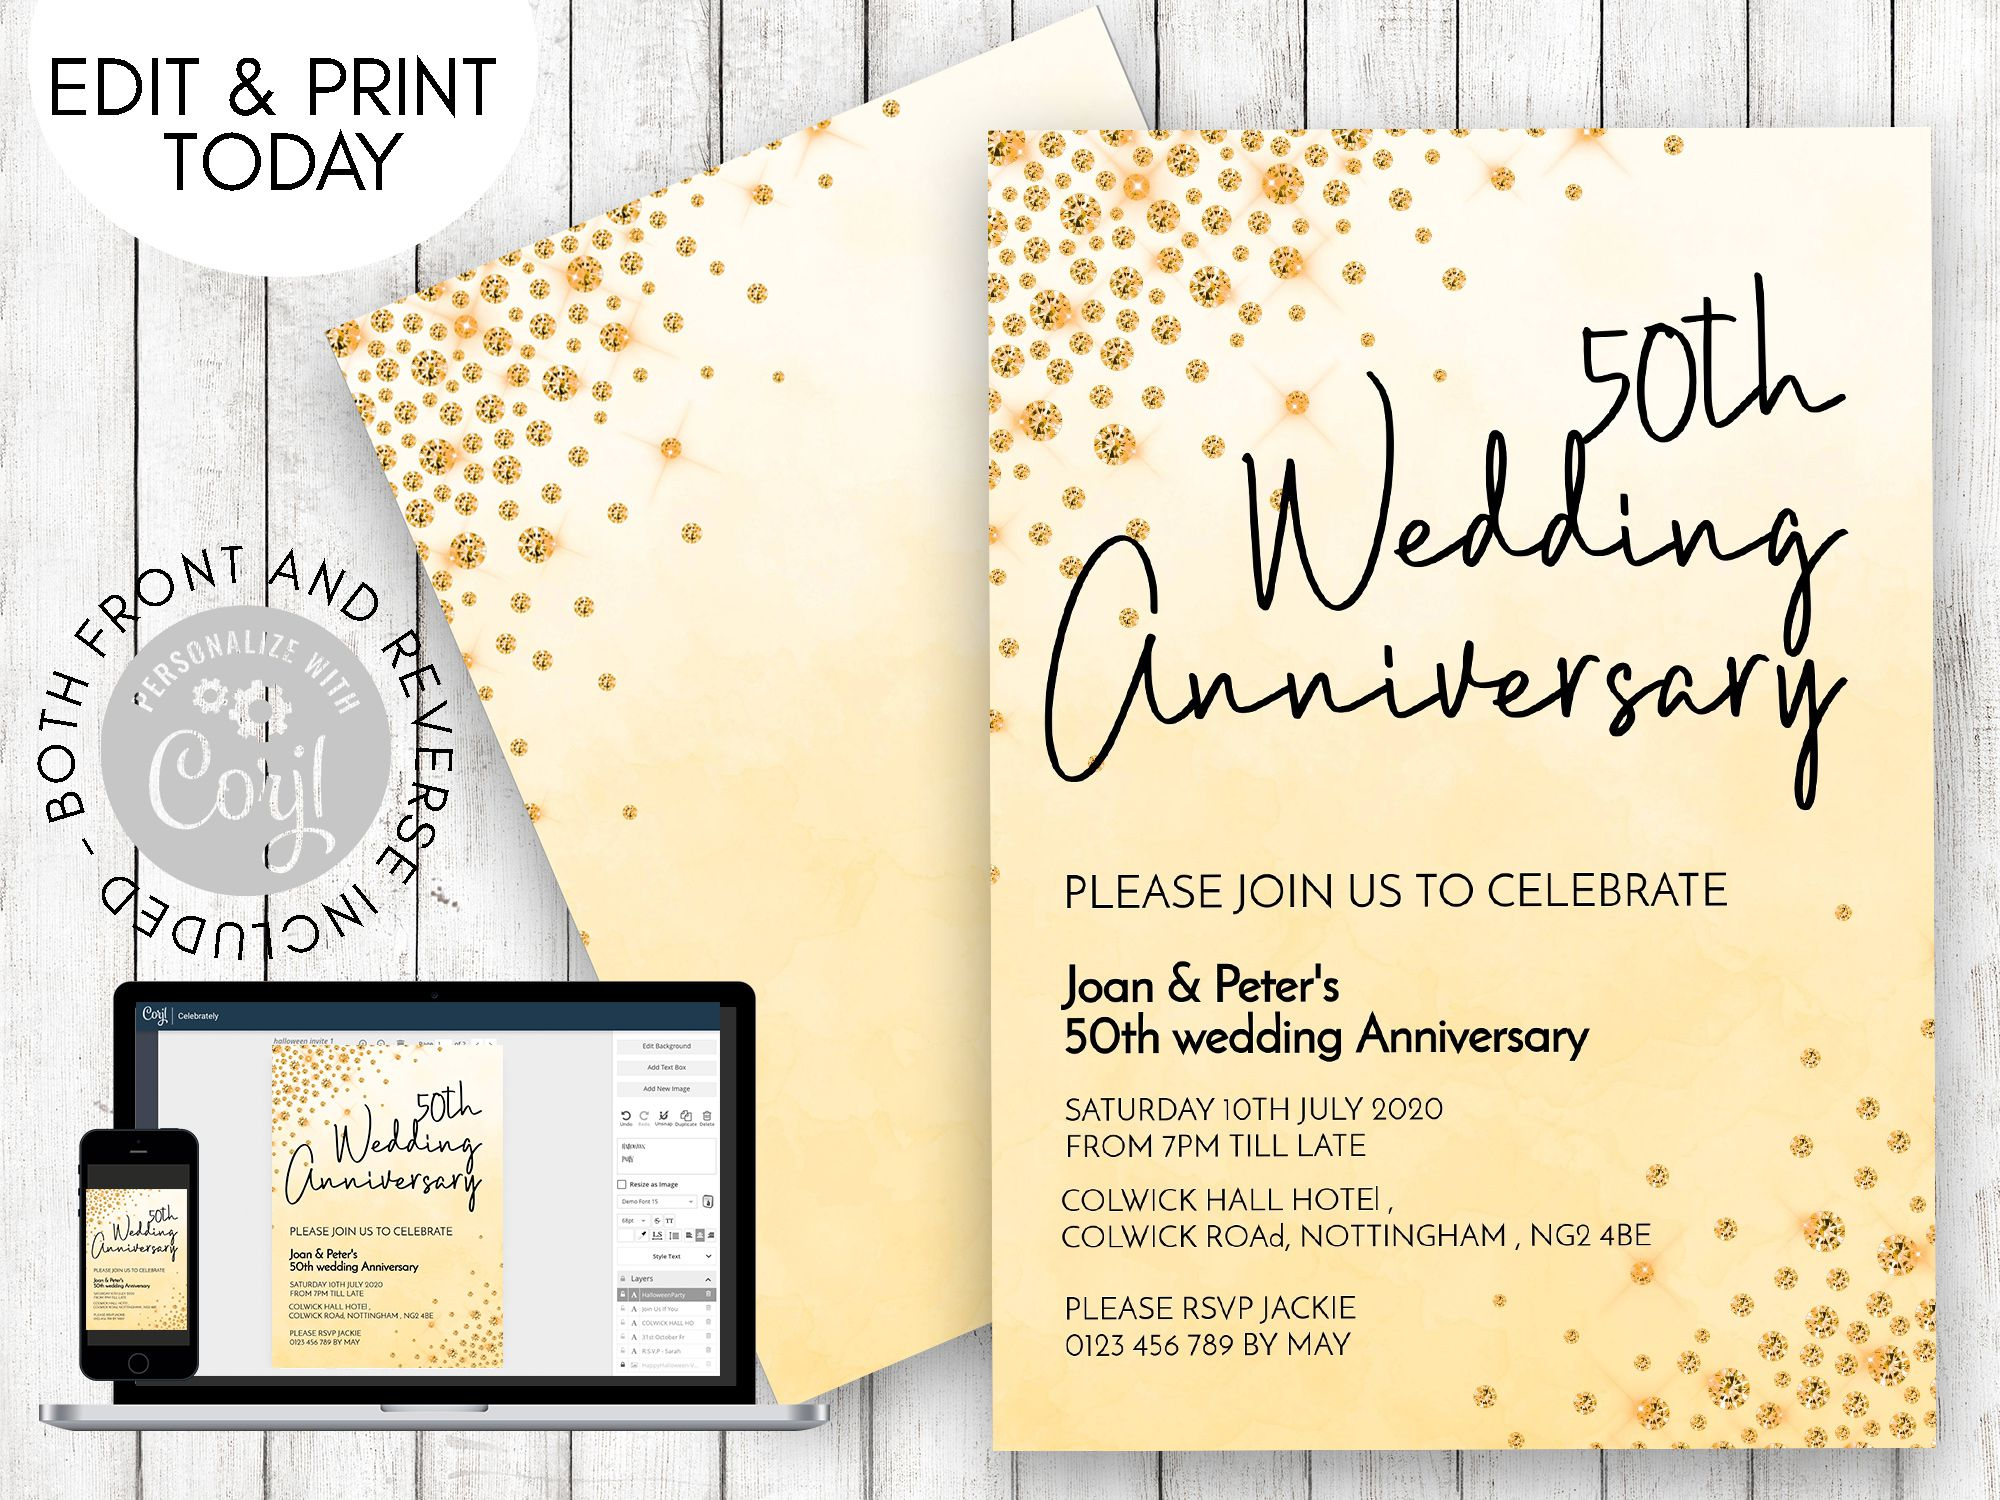 001 Striking Golden Wedding Anniversary Invitation Template Free Highest Quality  50th Microsoft Word DownloadFull